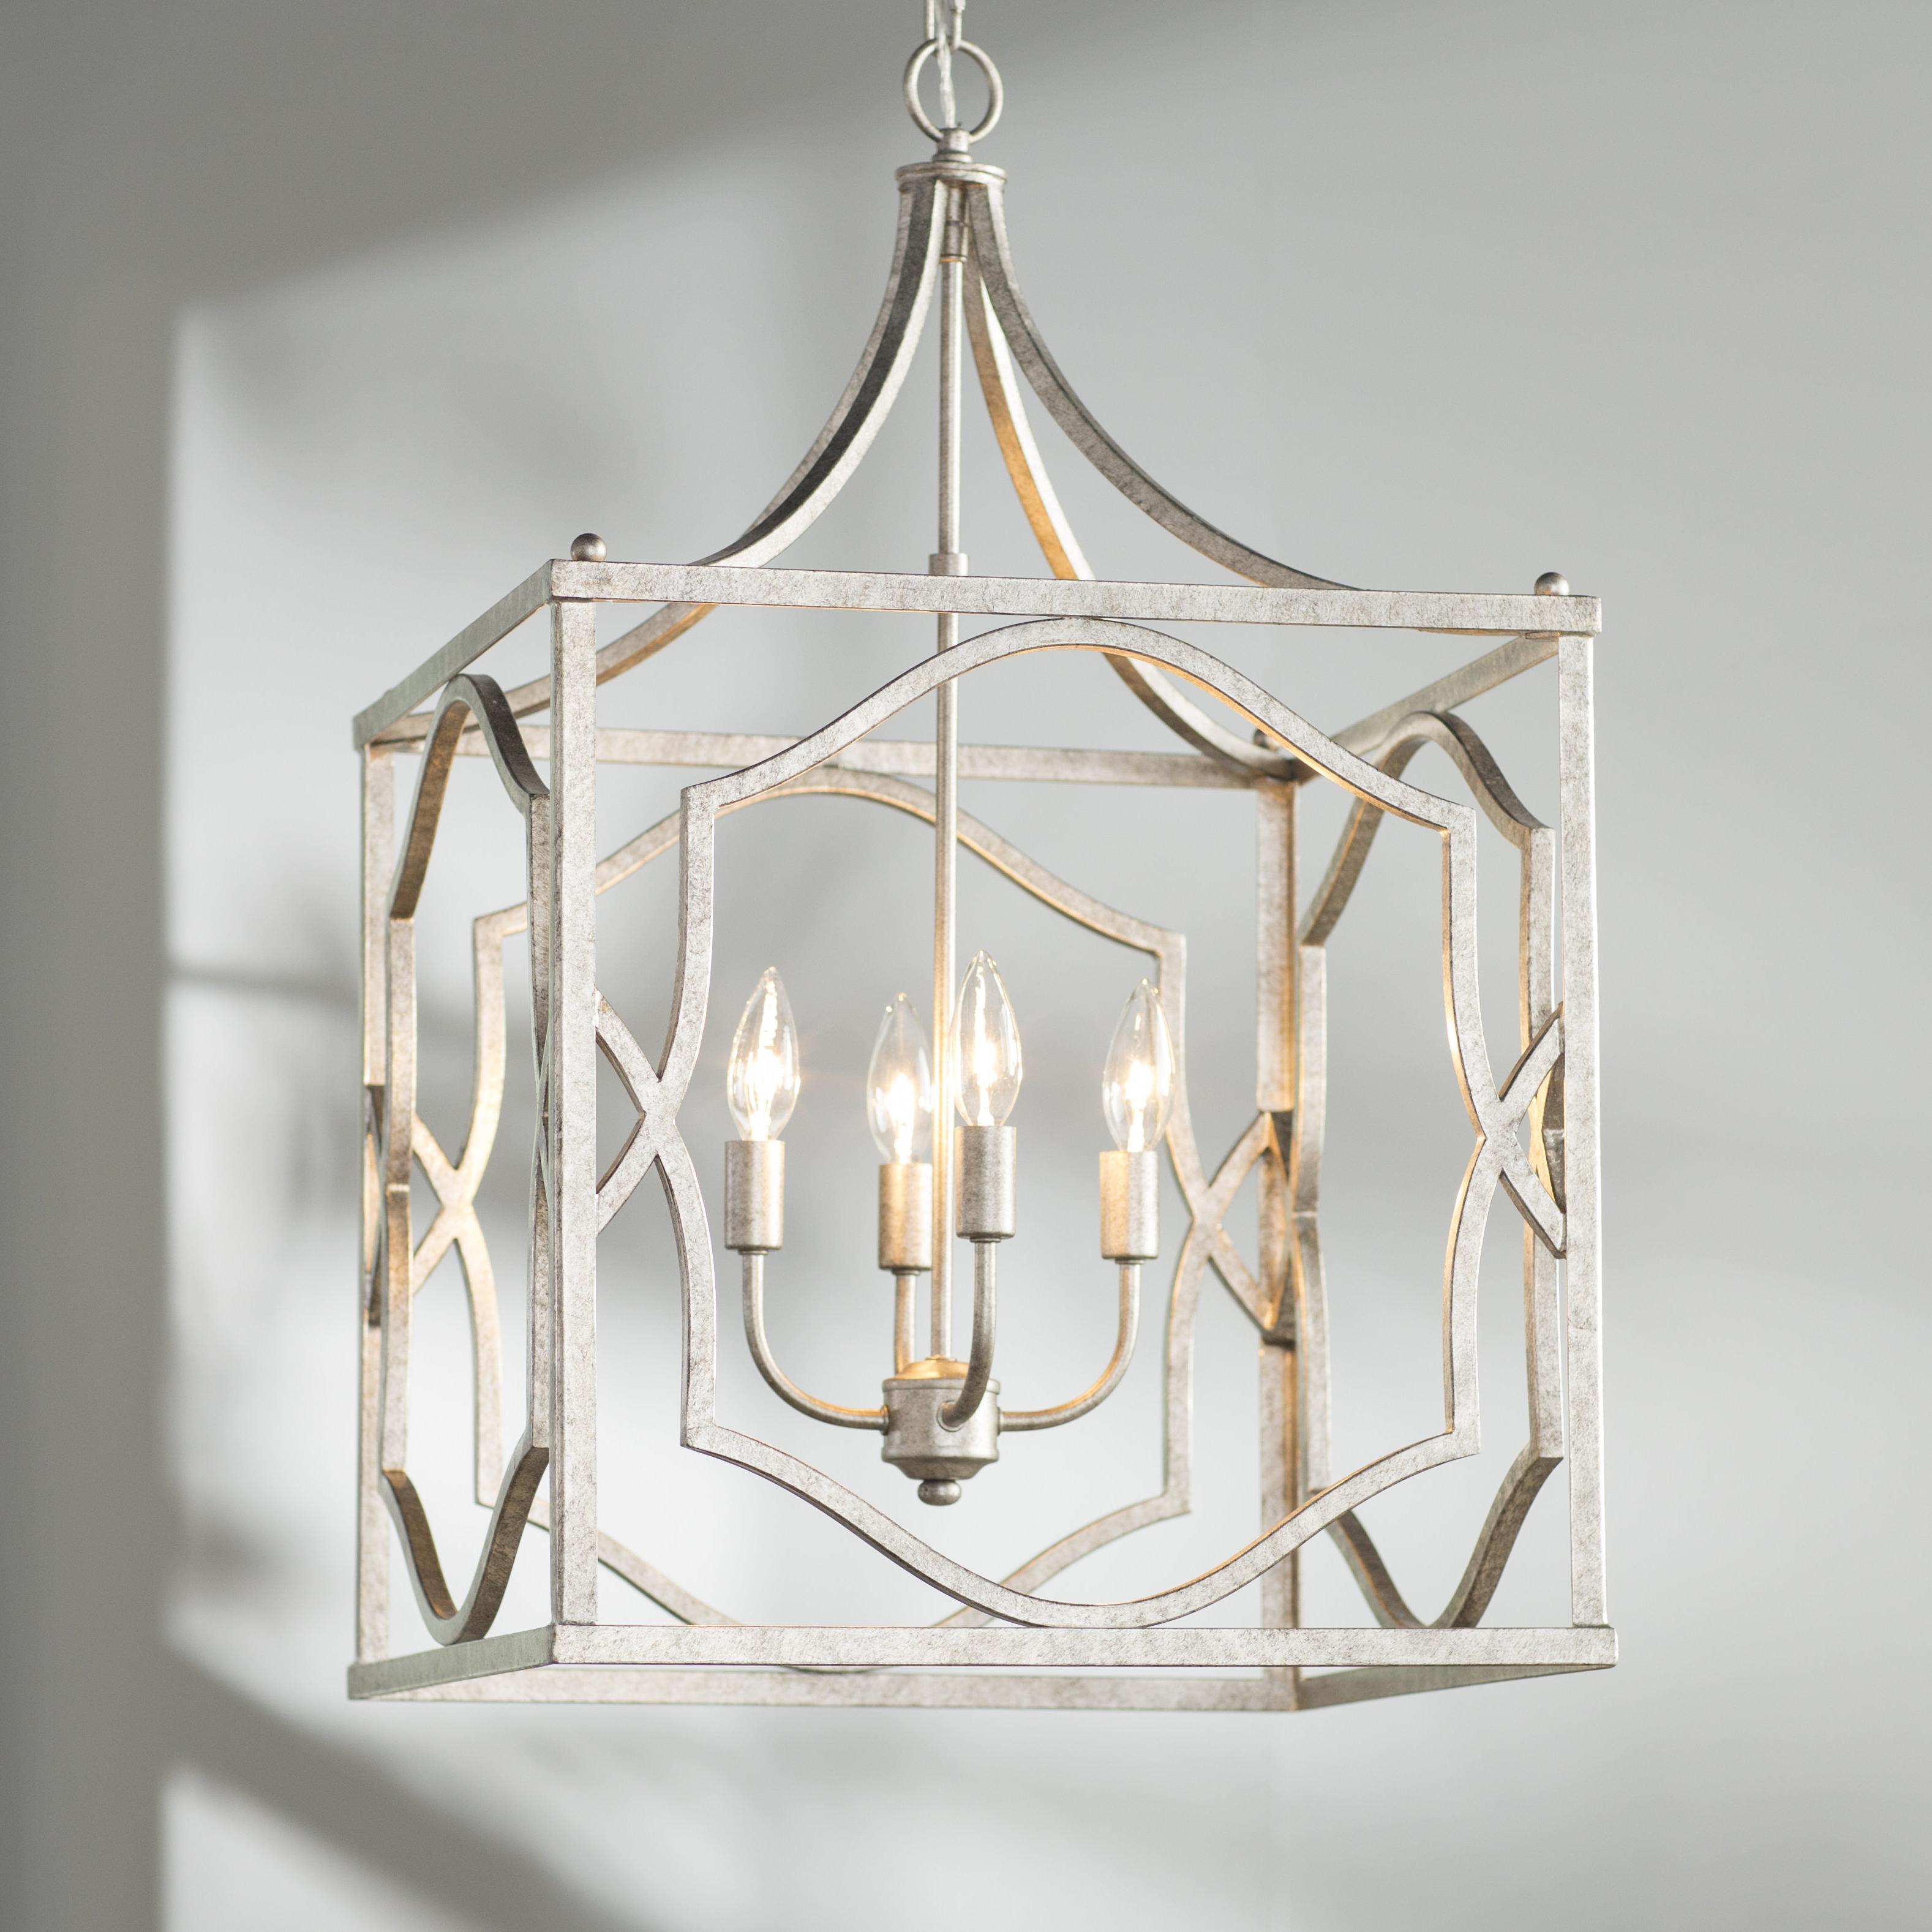 Freeburg 4 Light Lantern Square / Rectangle Pendants Throughout Most Popular Destrey 4 Light Lantern Square / Rectangle Pendant (View 5 of 20)